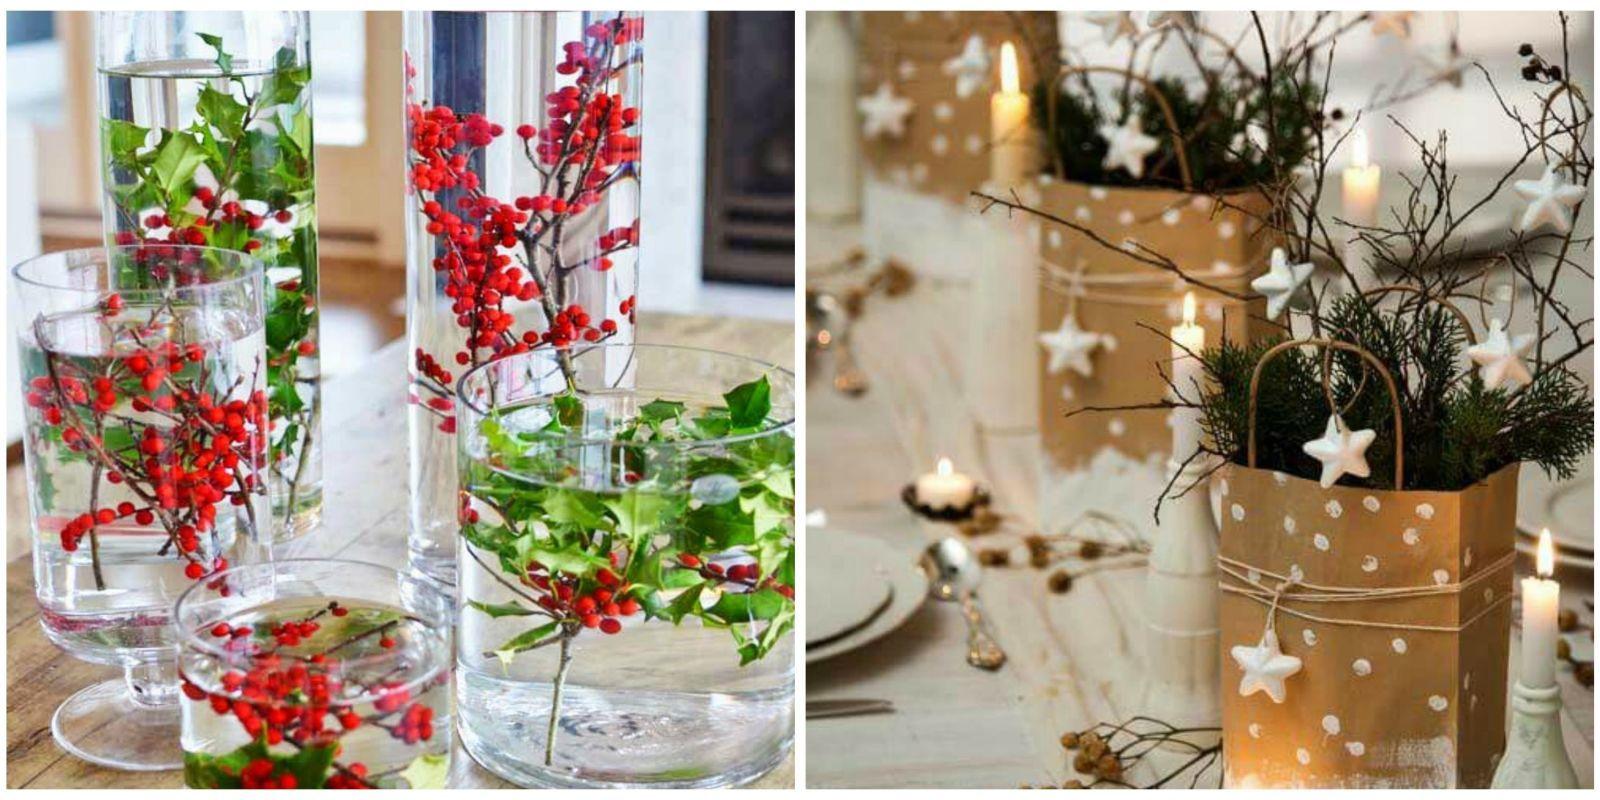 14 Best DIY Christmas Centerpieces Beautiful